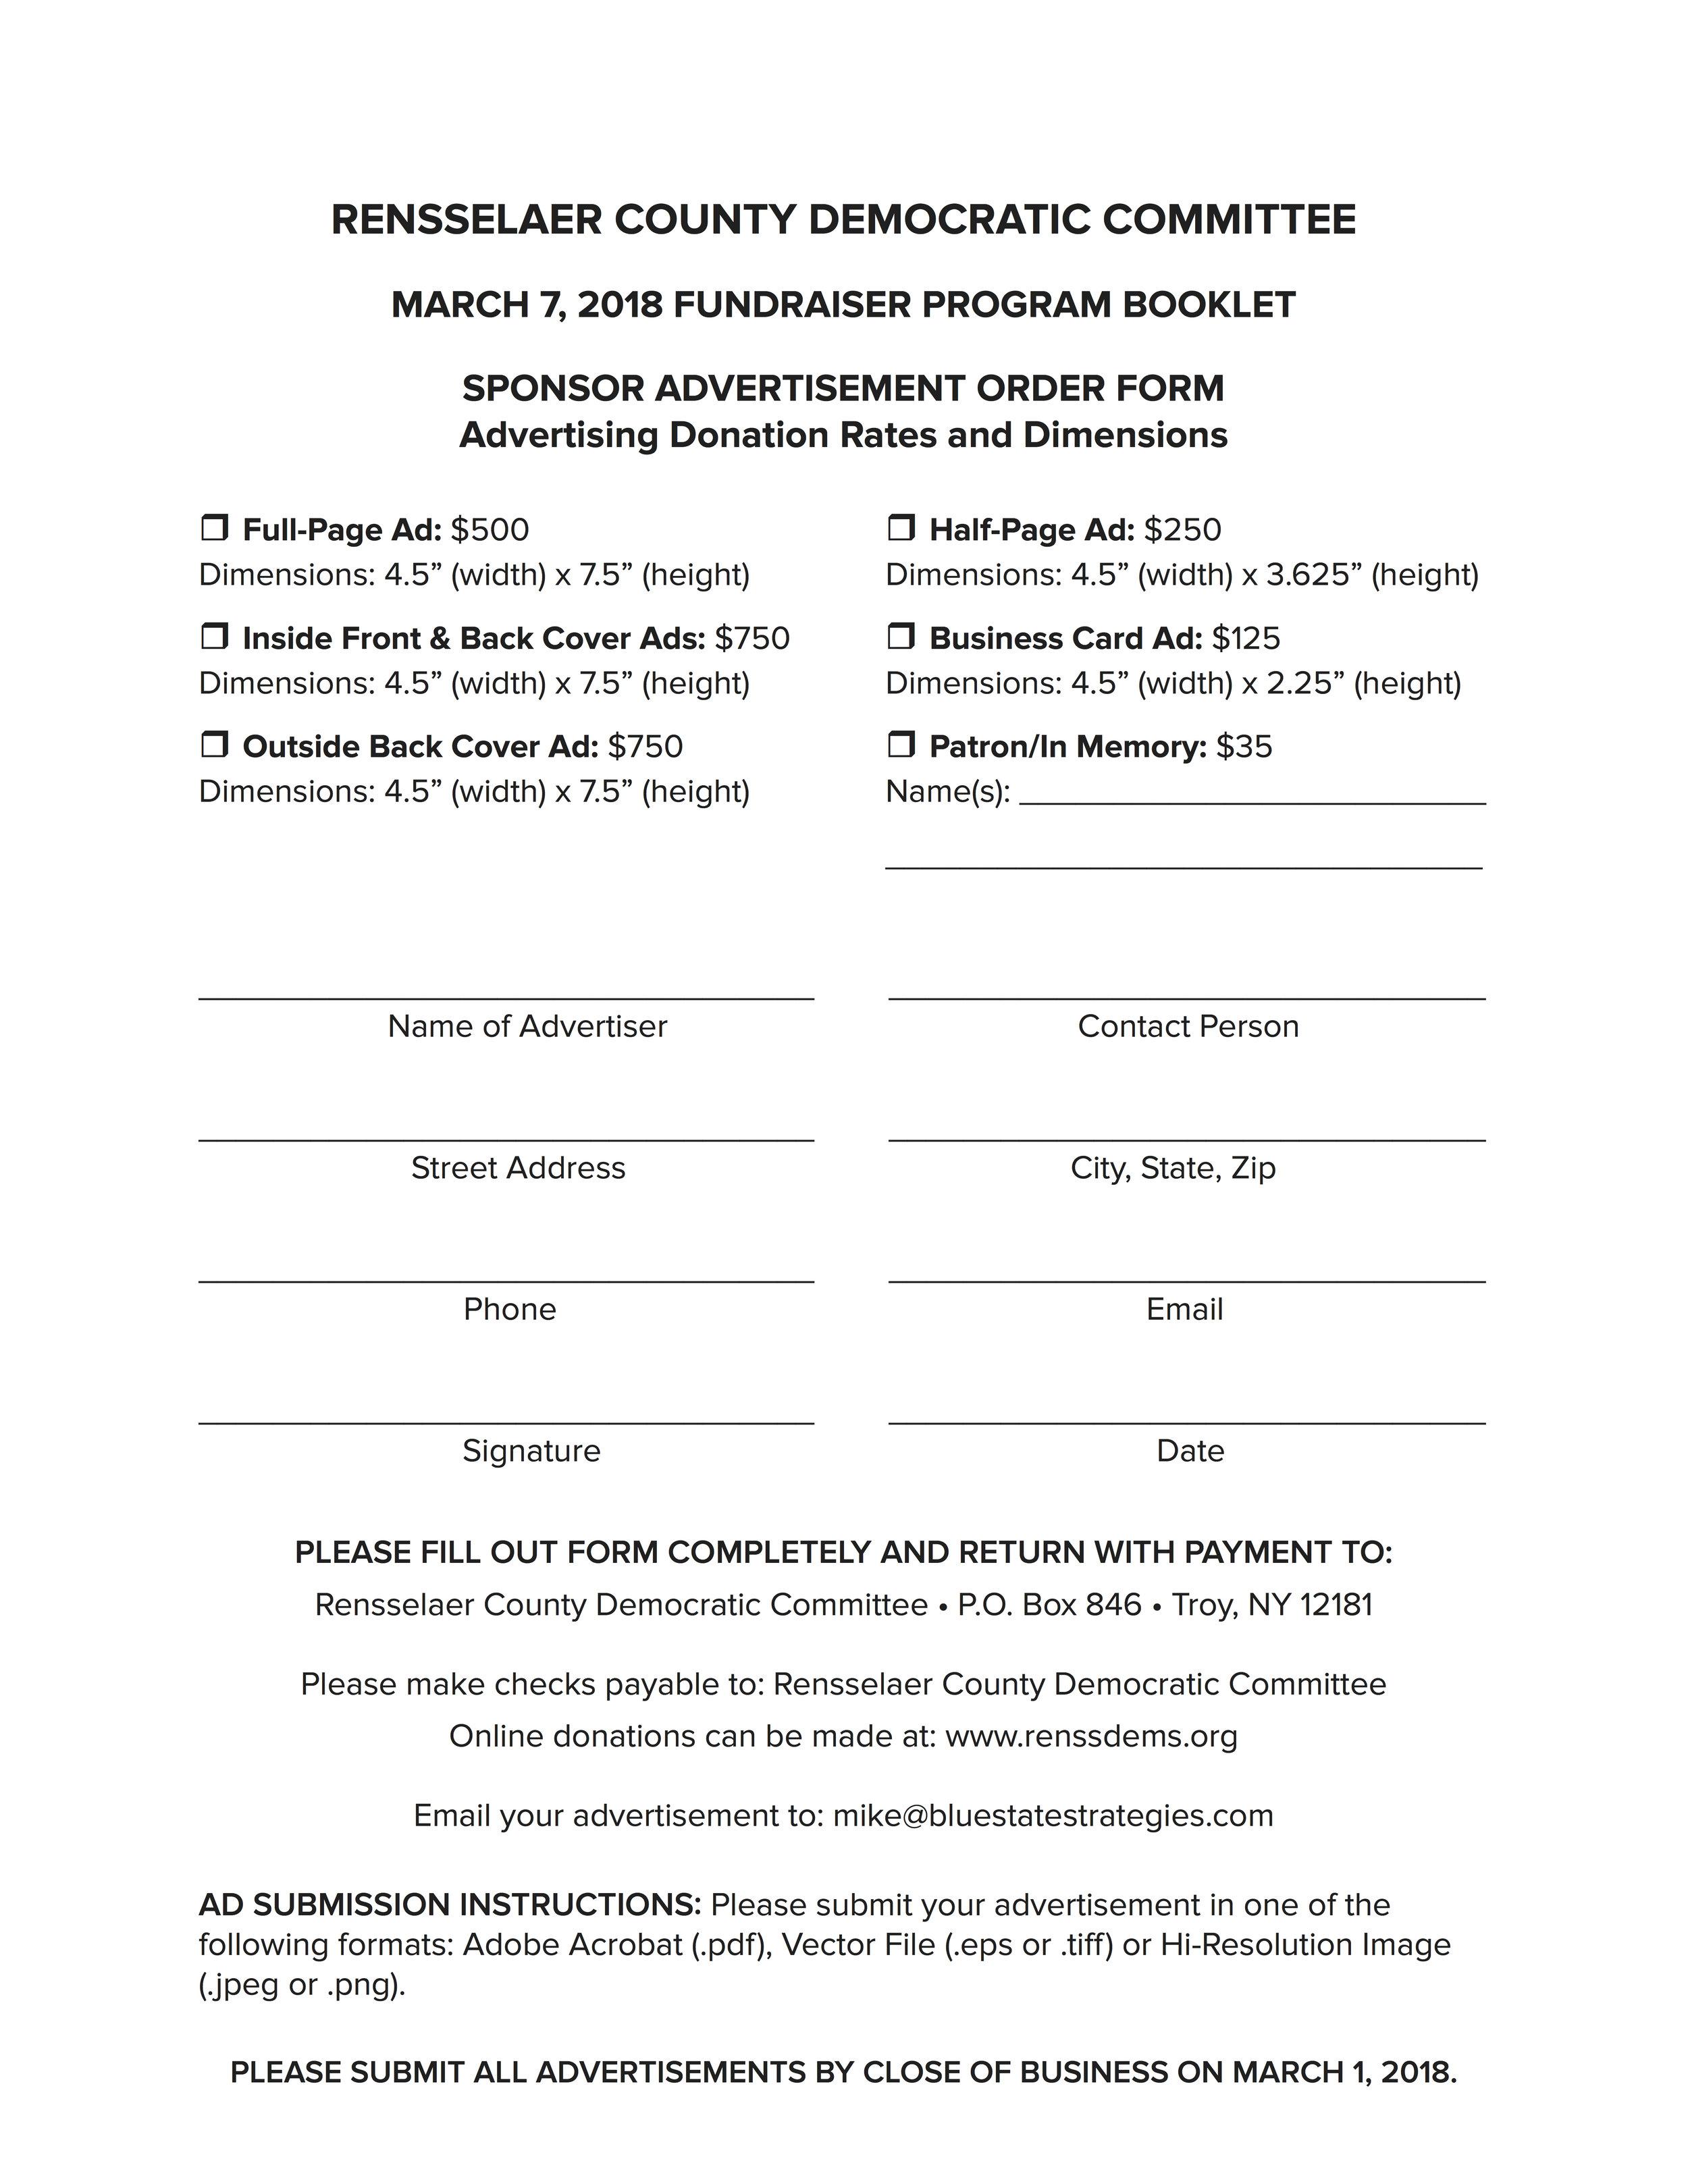 RCDC March 7 2018 Fundraiser Ad Order Form.jpg